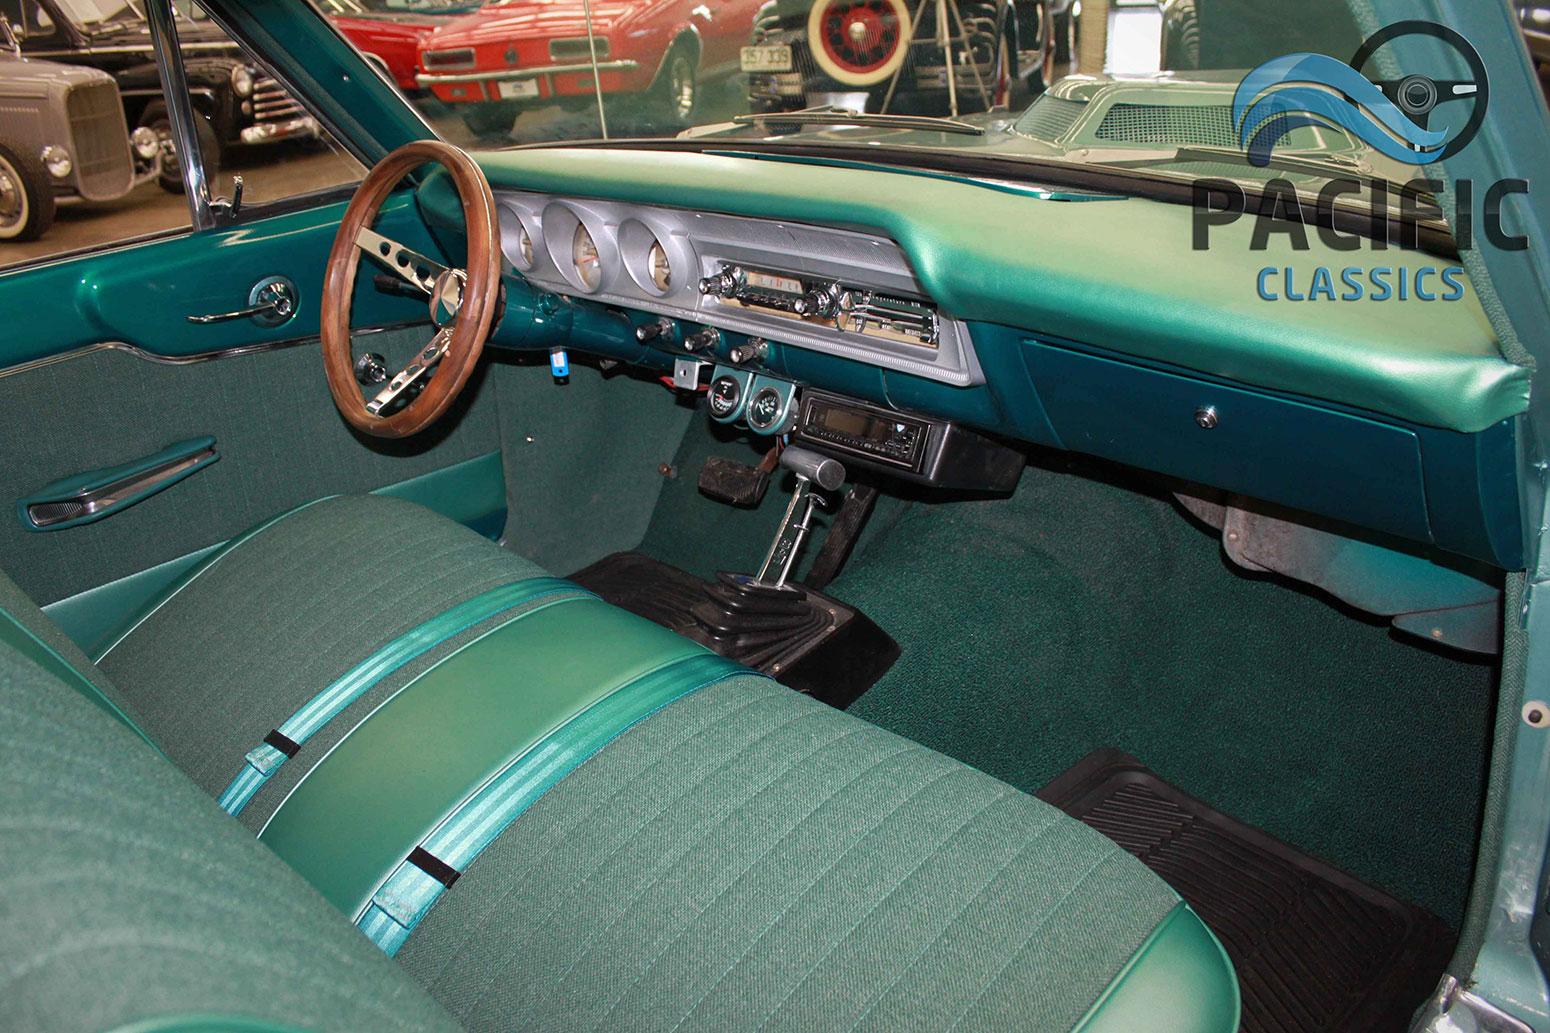 1964 Ford Fairlane 500